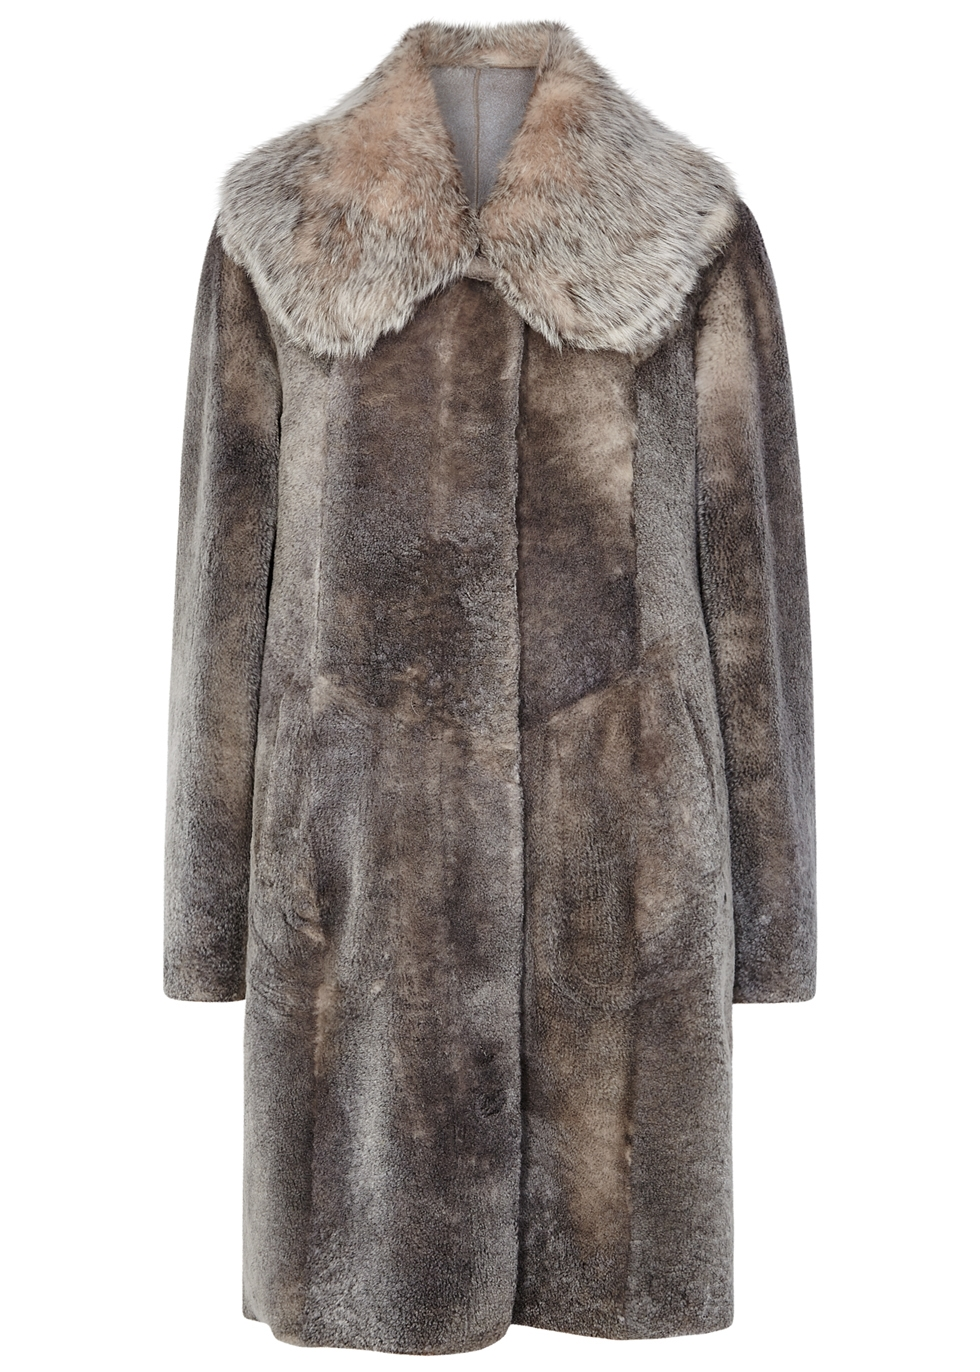 DOM GOOR Grey Fur-Effect Shearling Coat